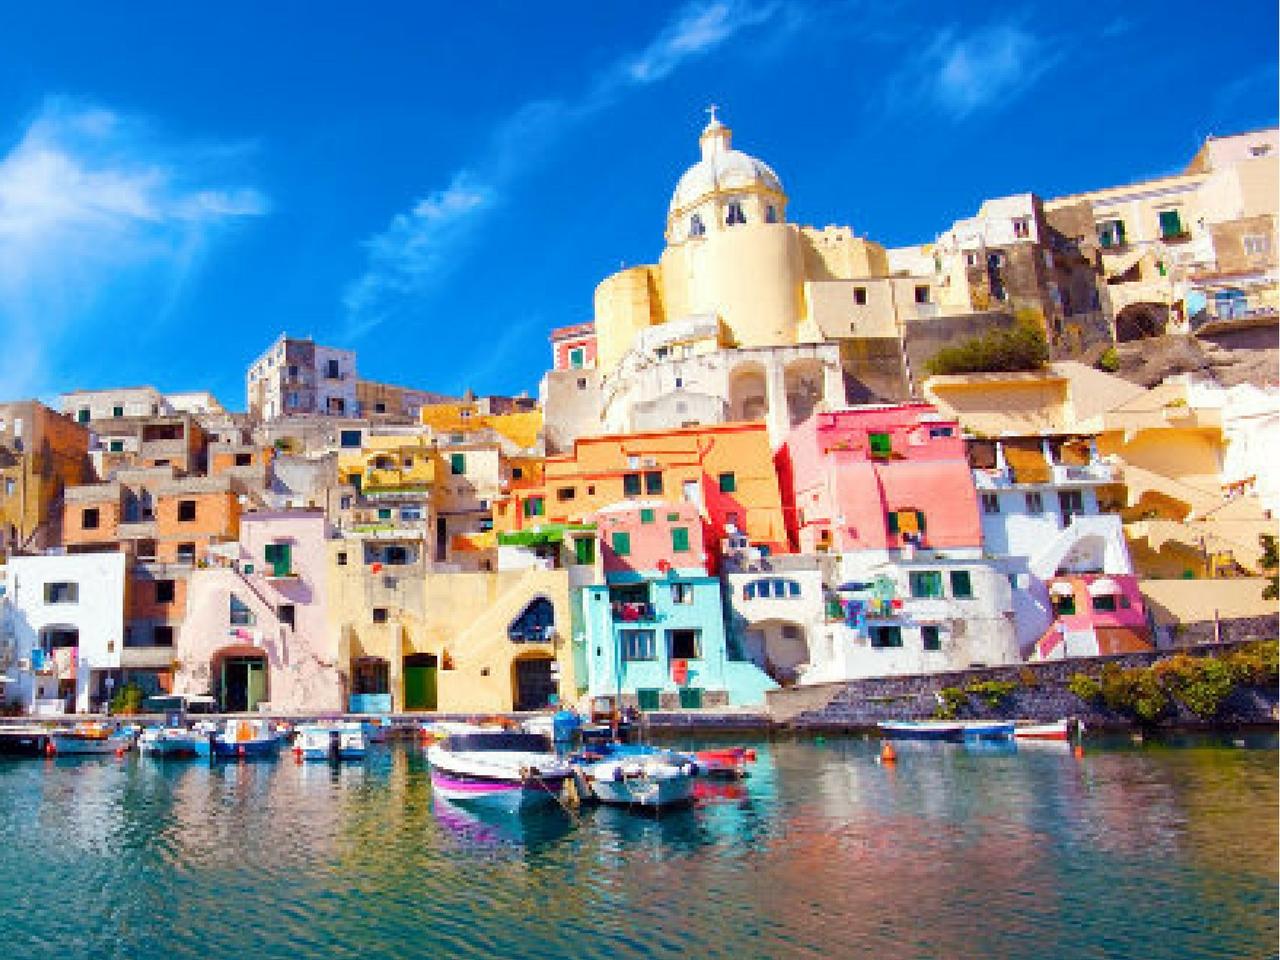 Ciudades de Italia - Viajar a Italia